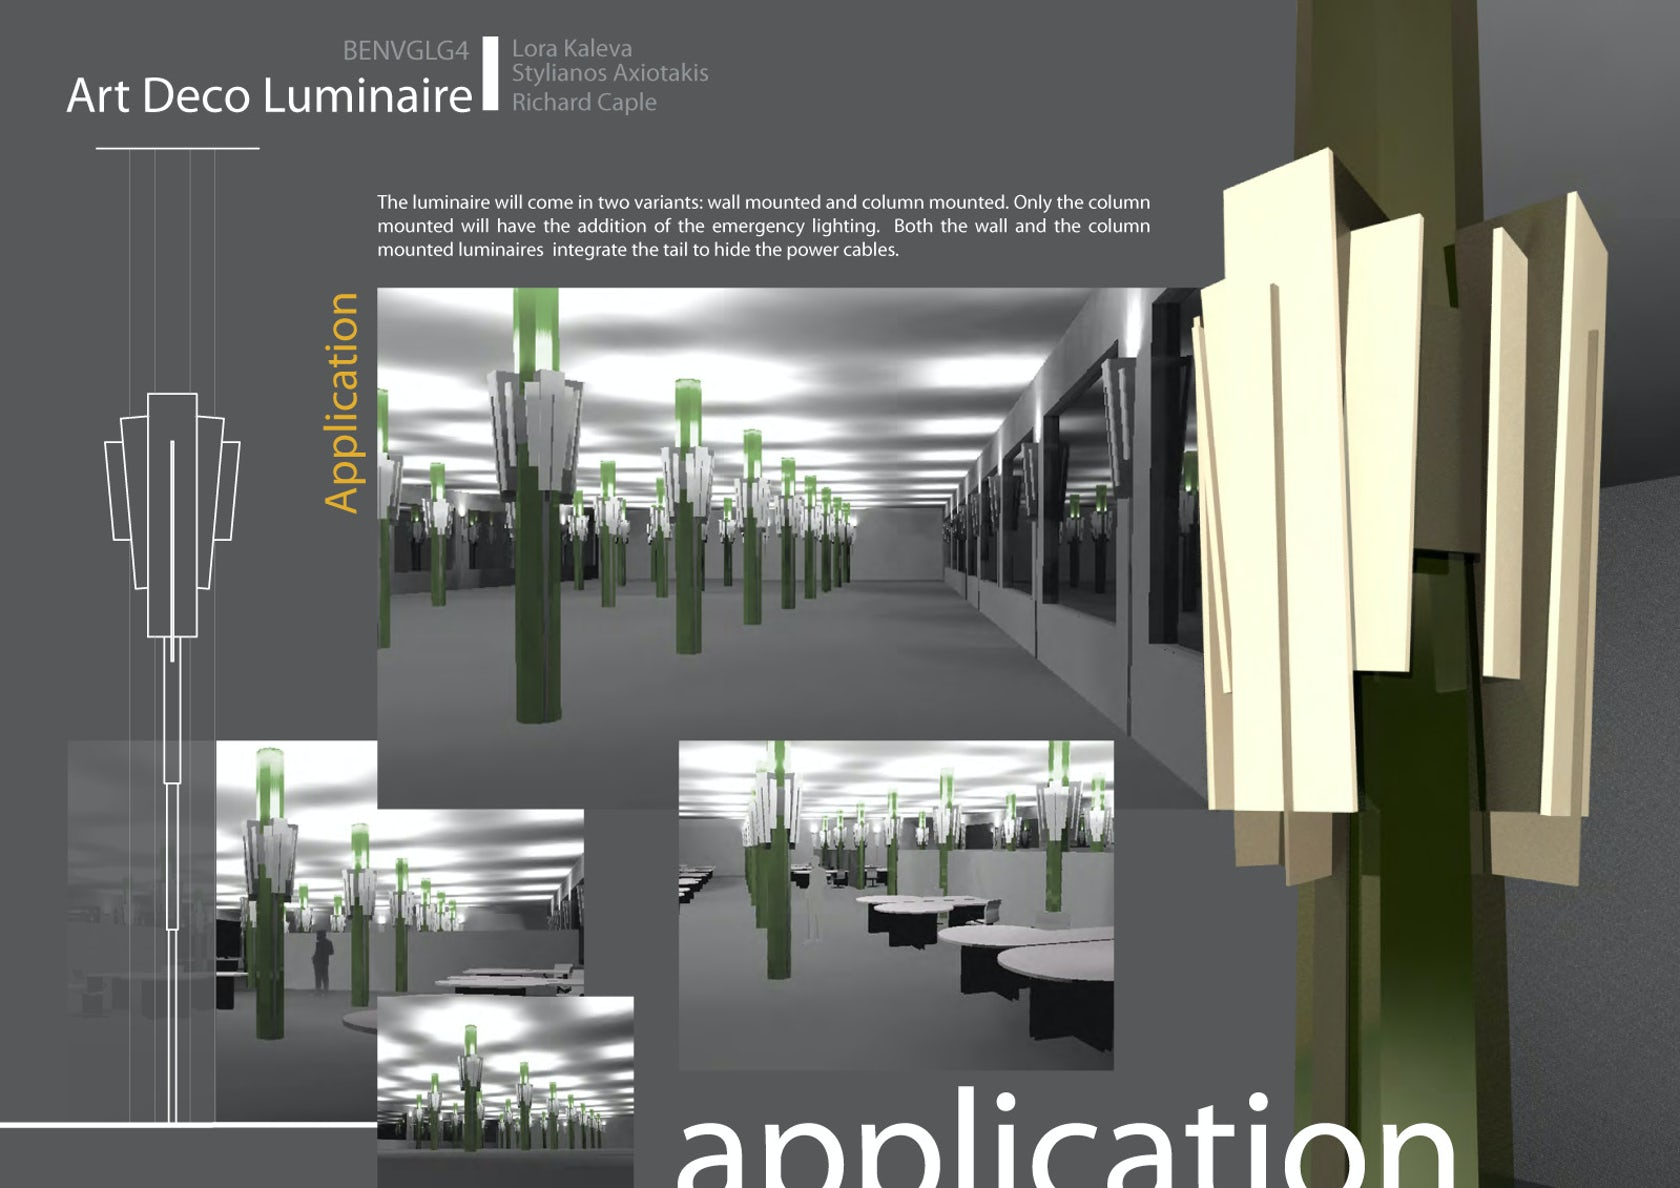 Art deco luminaire design architizer - Luminaire art deco plafonnier ...